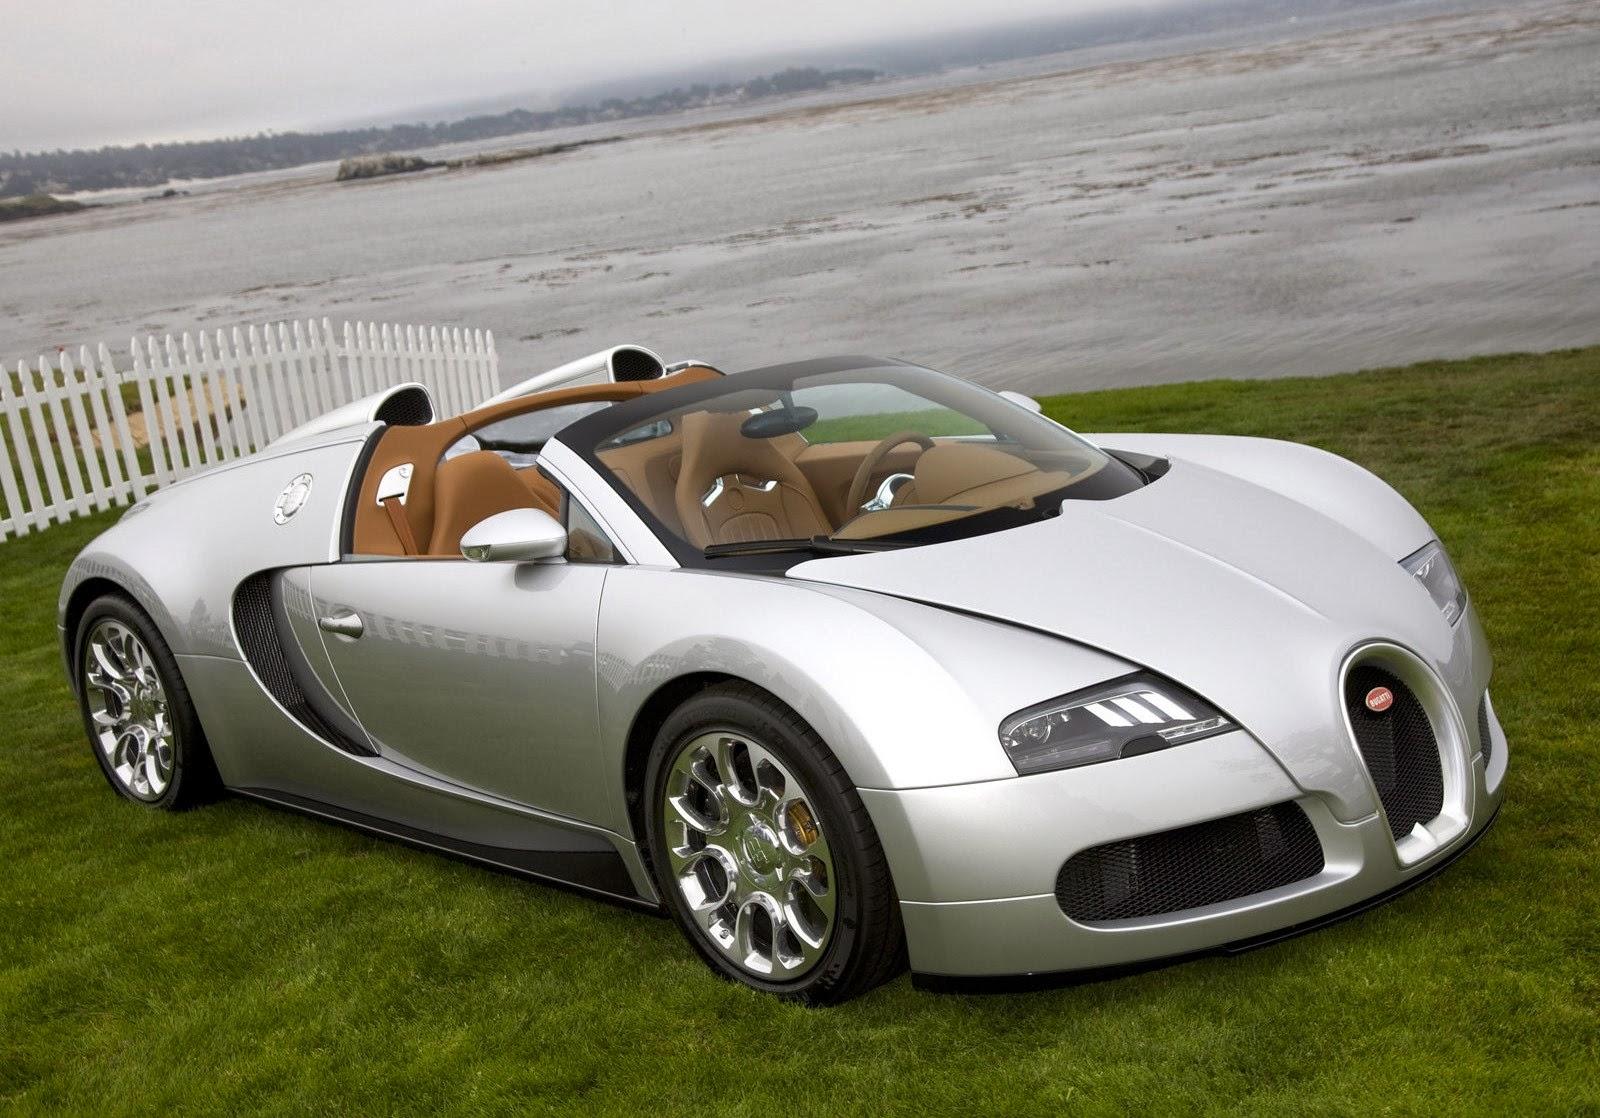 Bugatti Veyron 16.4 Grand Sport Green 2014 Wallpaper